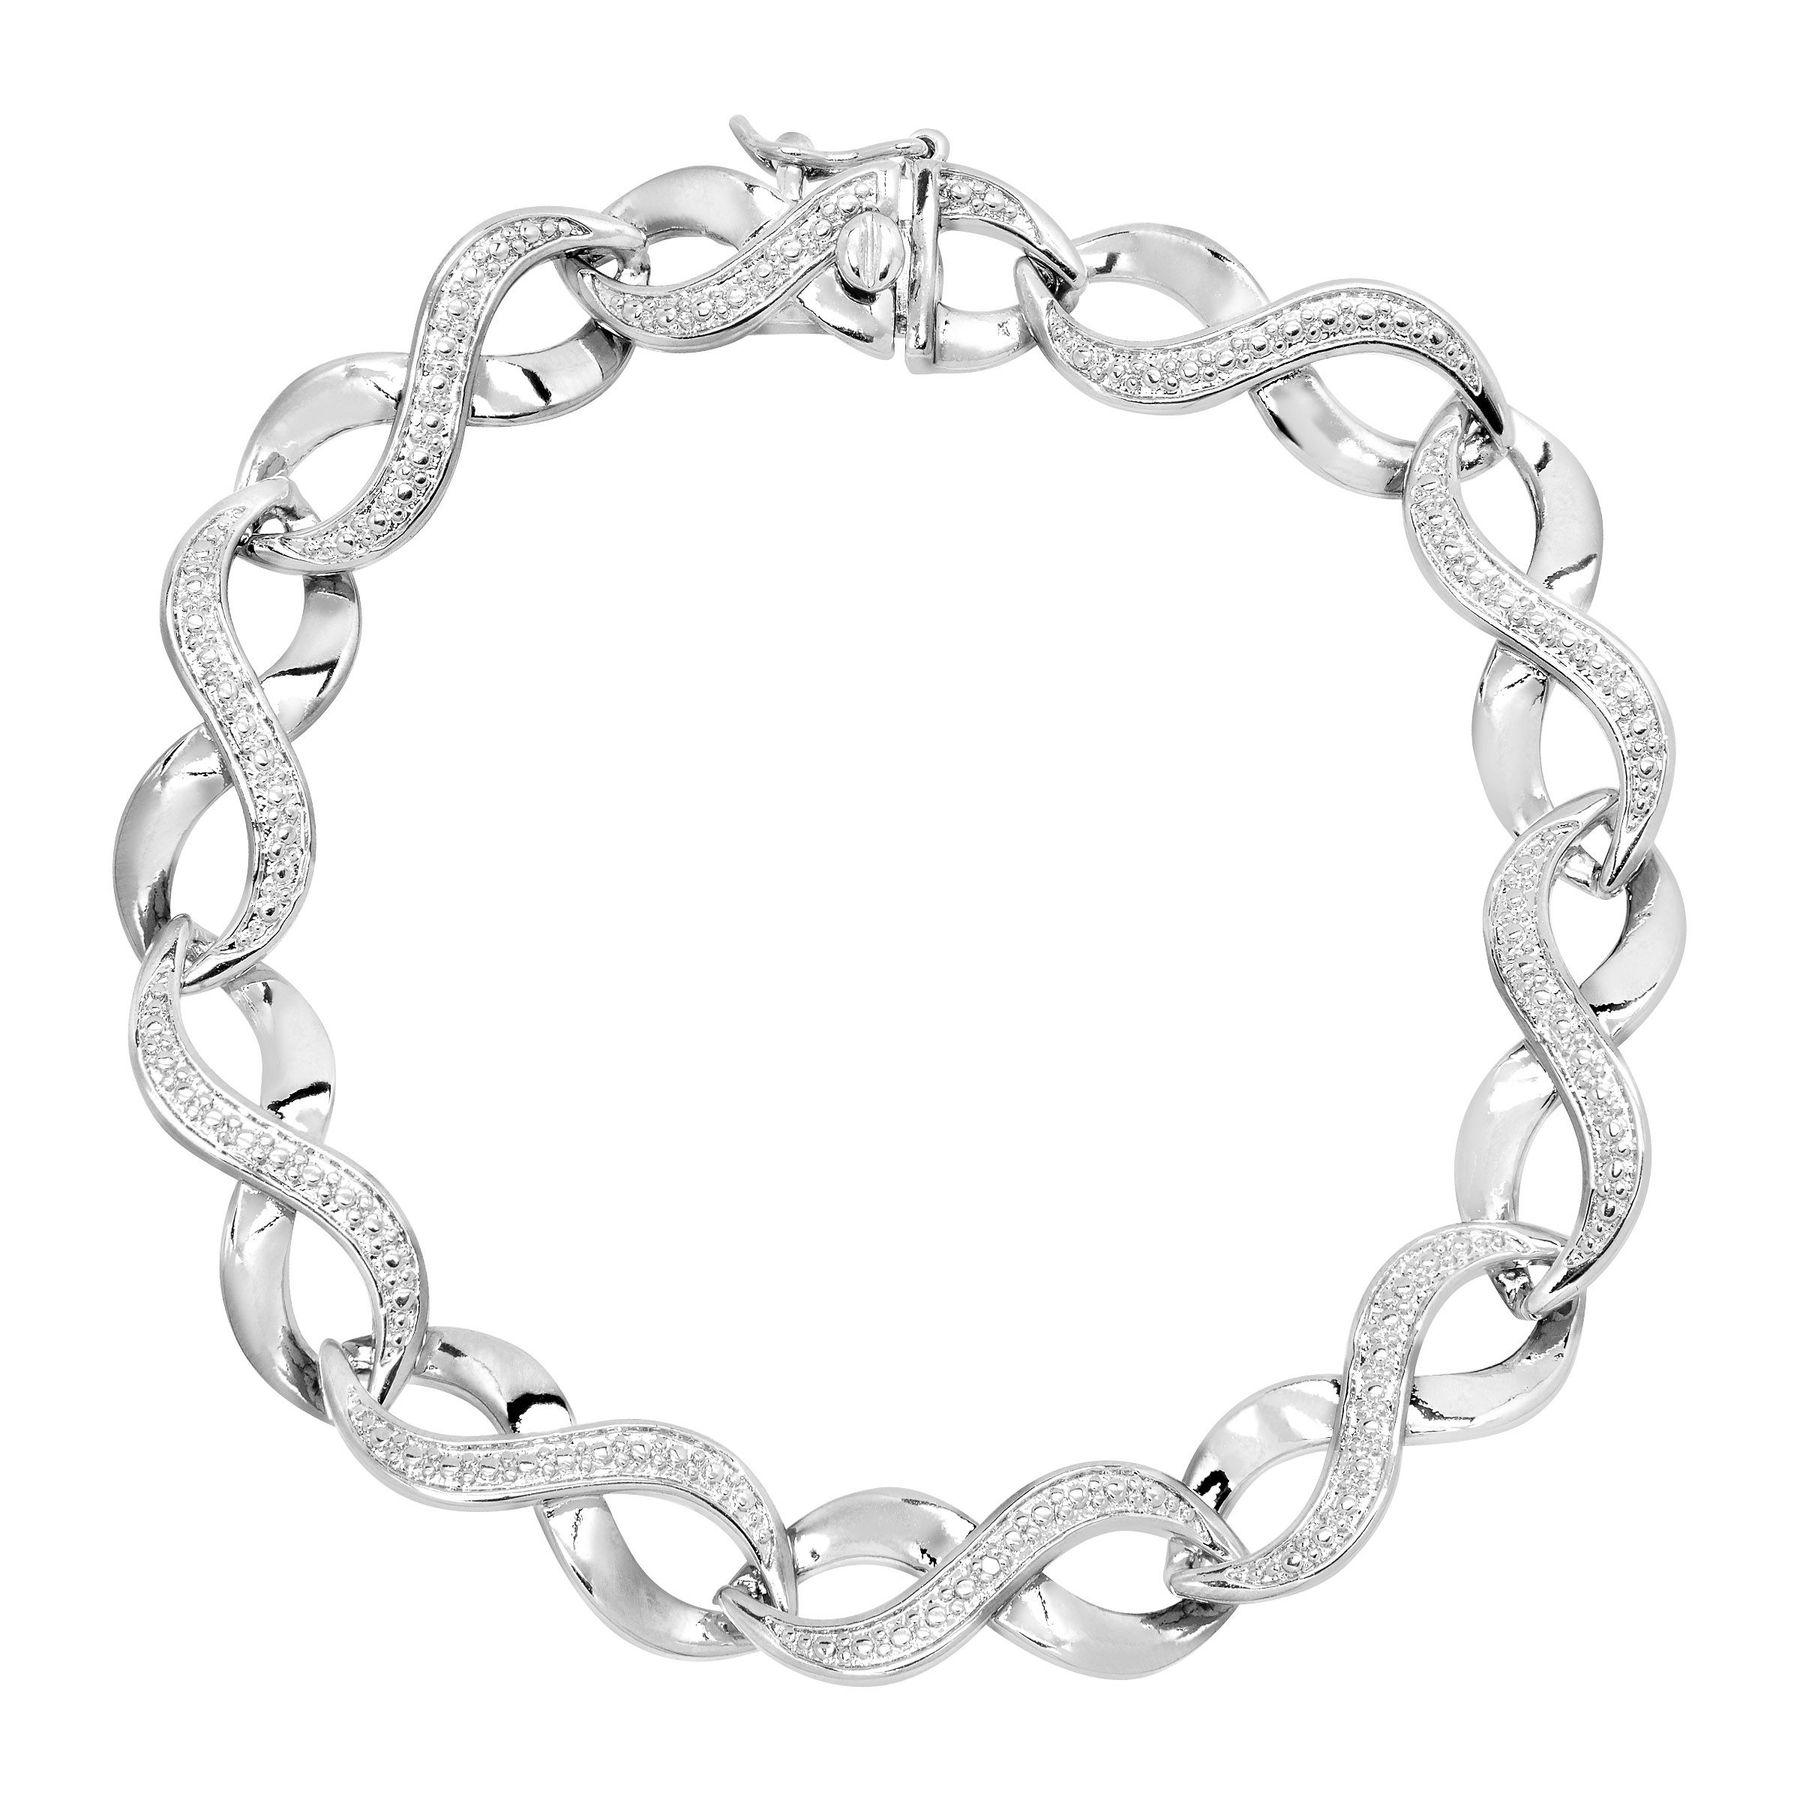 Black and white diamond infinity bracelet best bracelet 2018 for Jared jewelry the loop